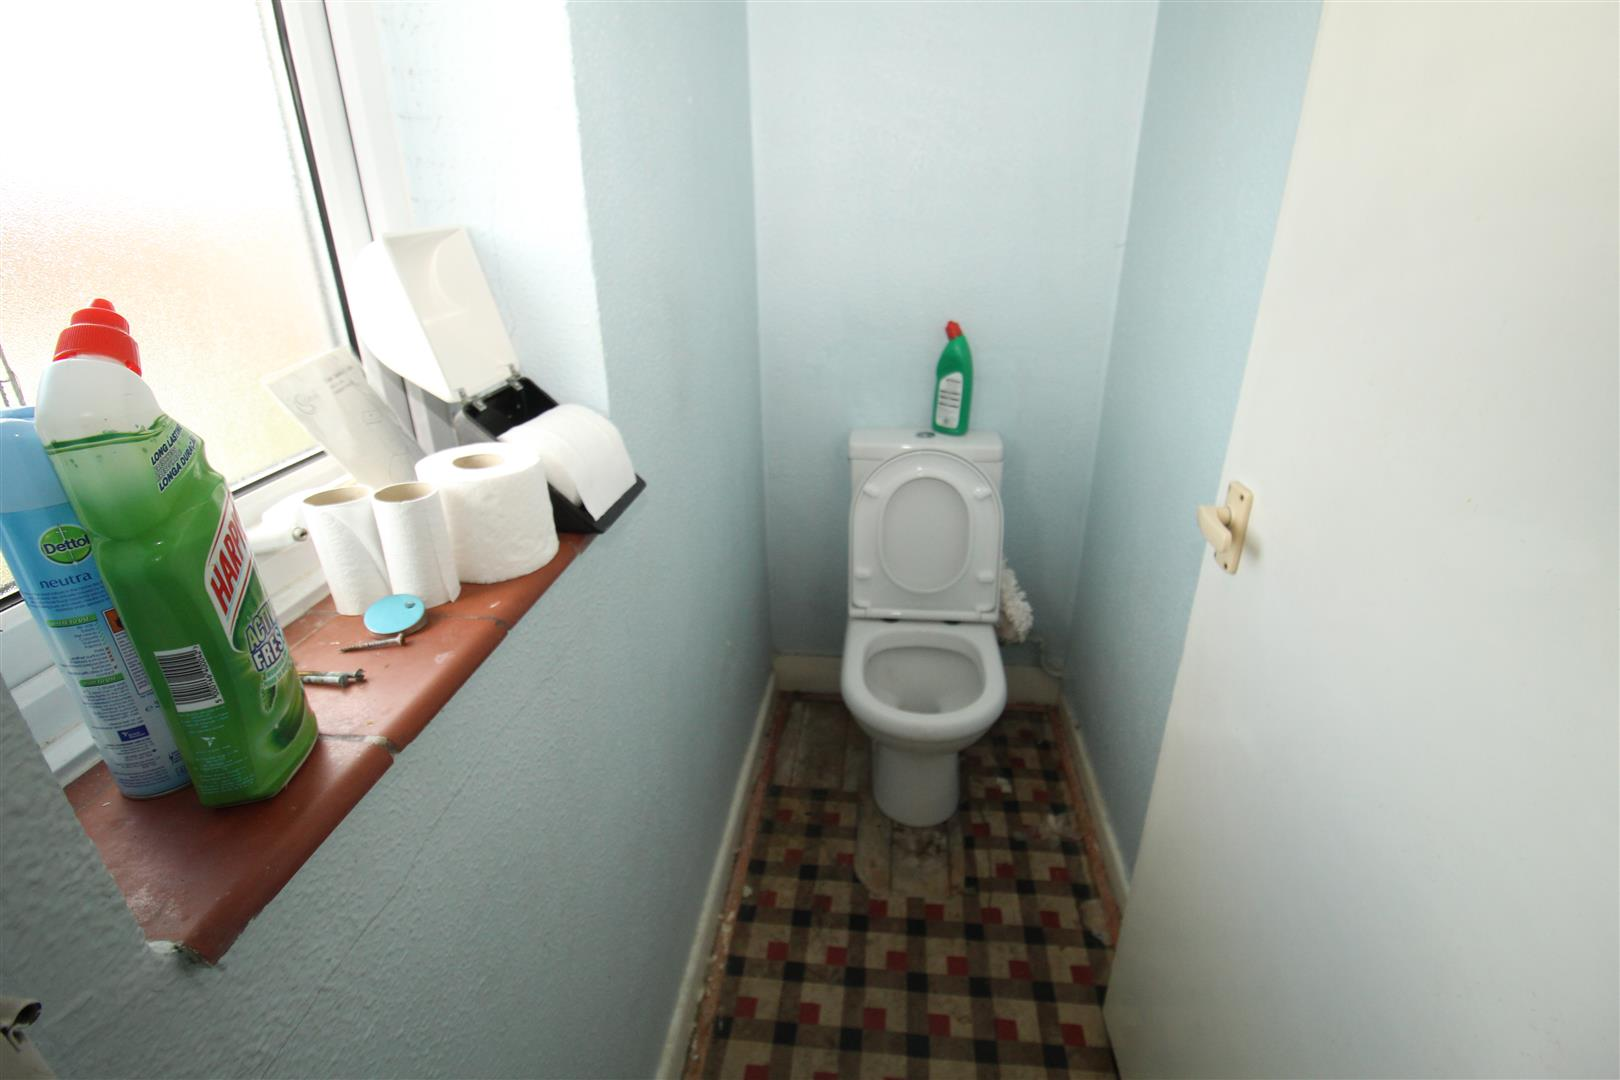 3 Bedrooms, House - Semi-Detached, Taunton Drive, Liverpool